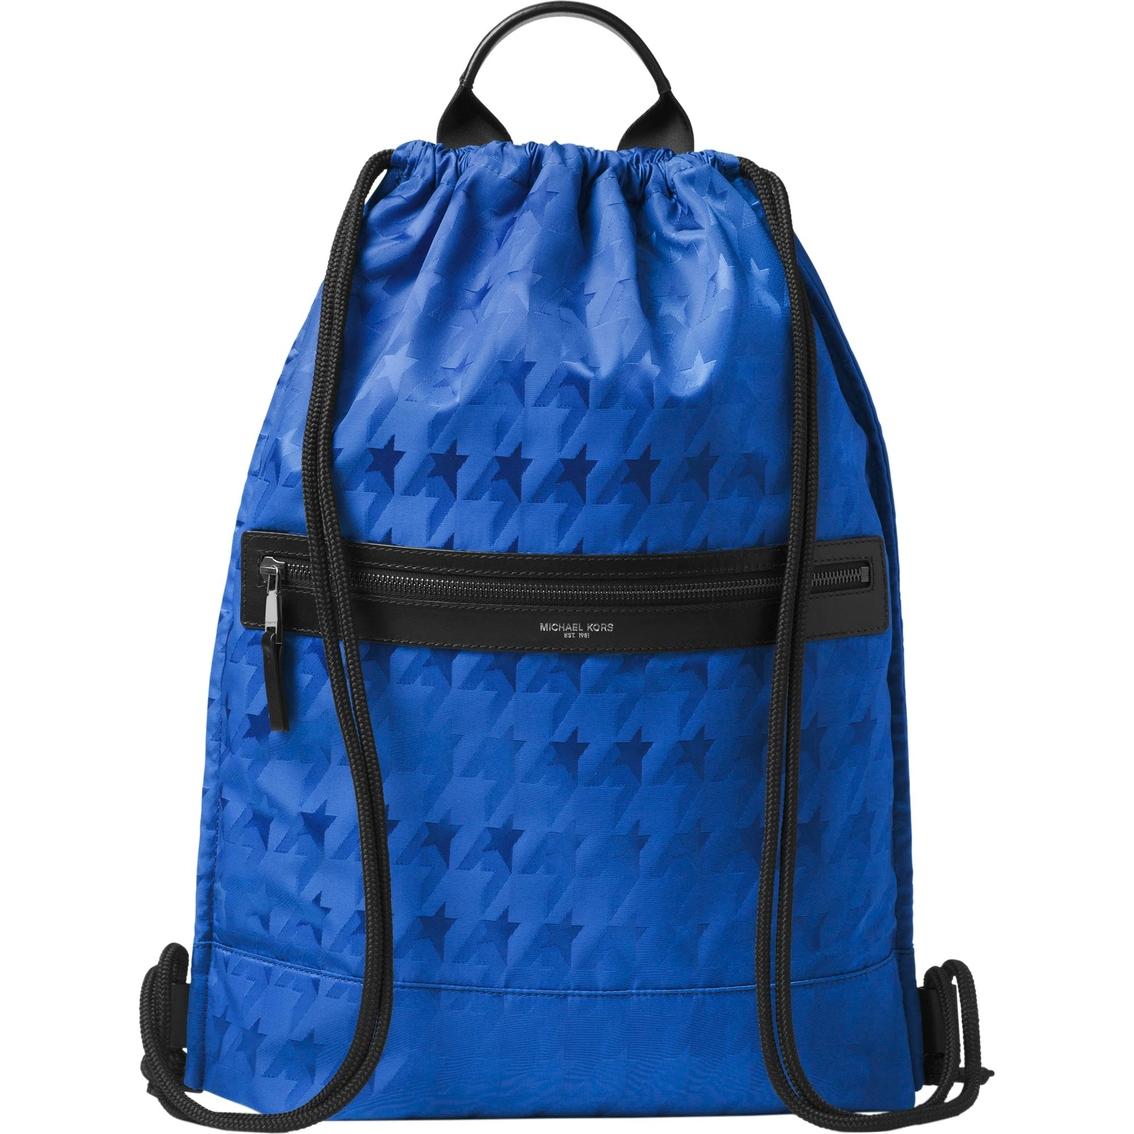 891ac92aefca Michael Kors Kent Startooth Jacquard Flat Drawstring Backpack ...